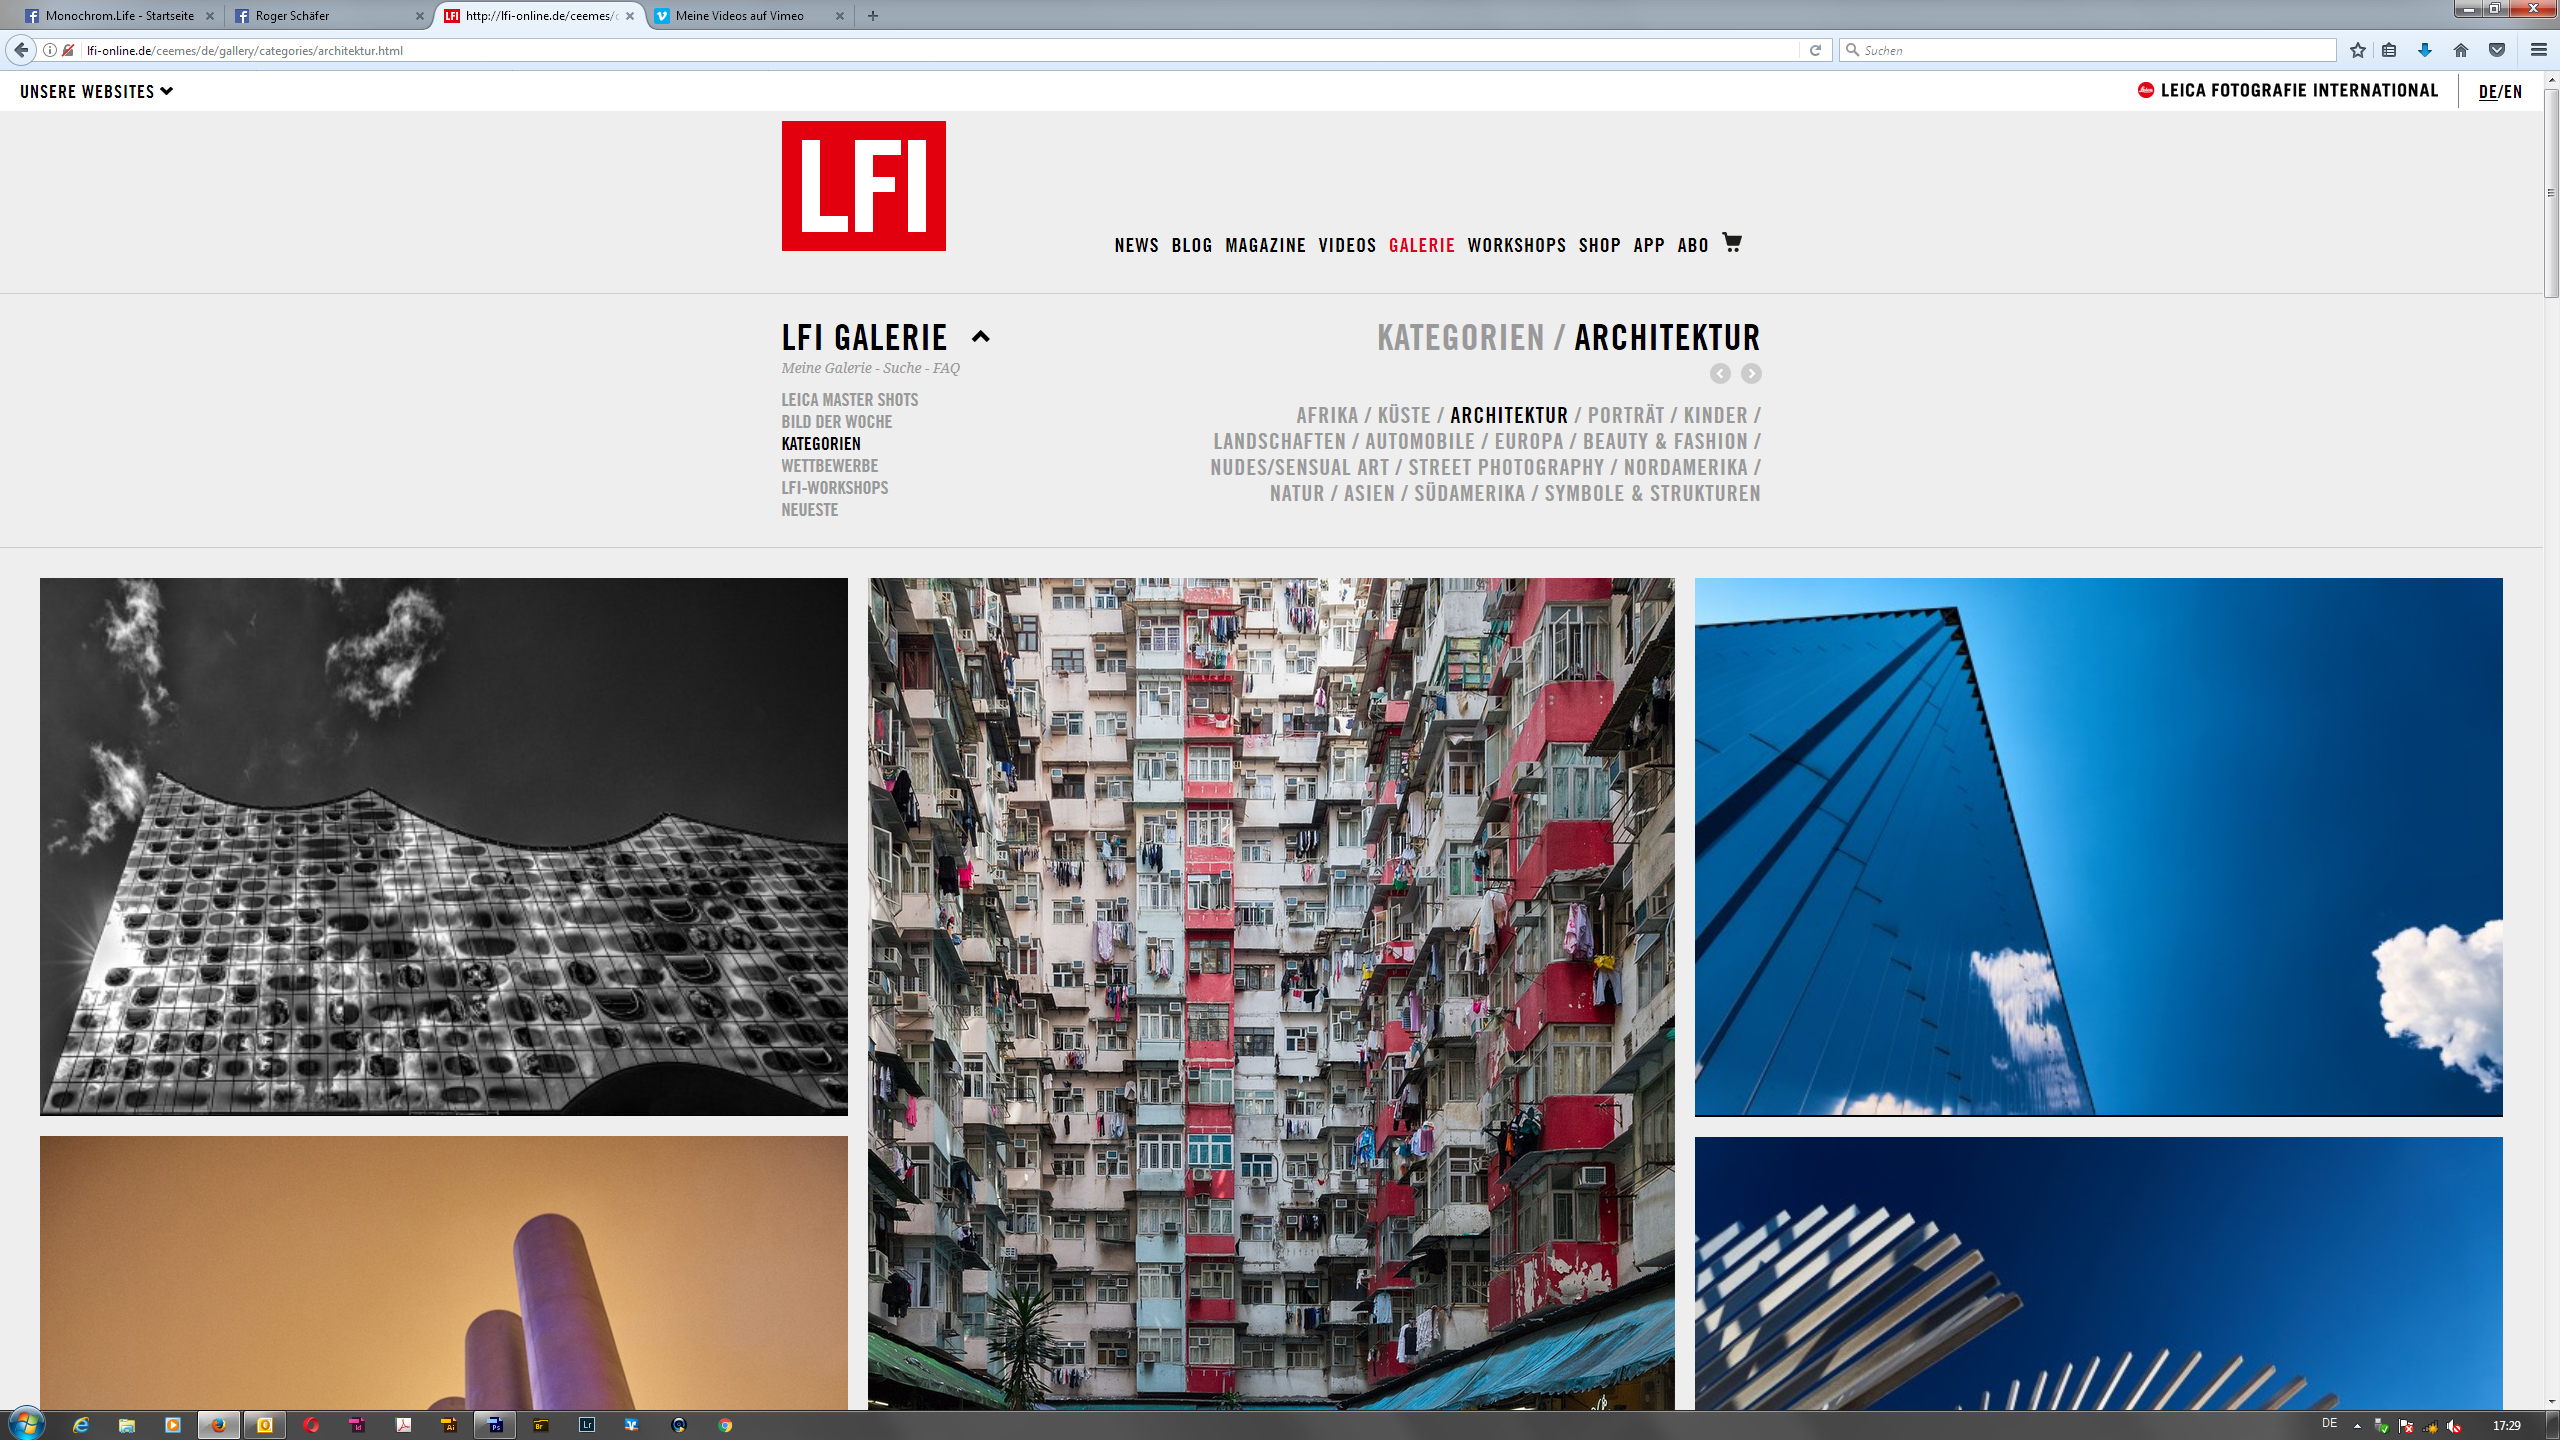 LFI_Architektur_05_2017 by .